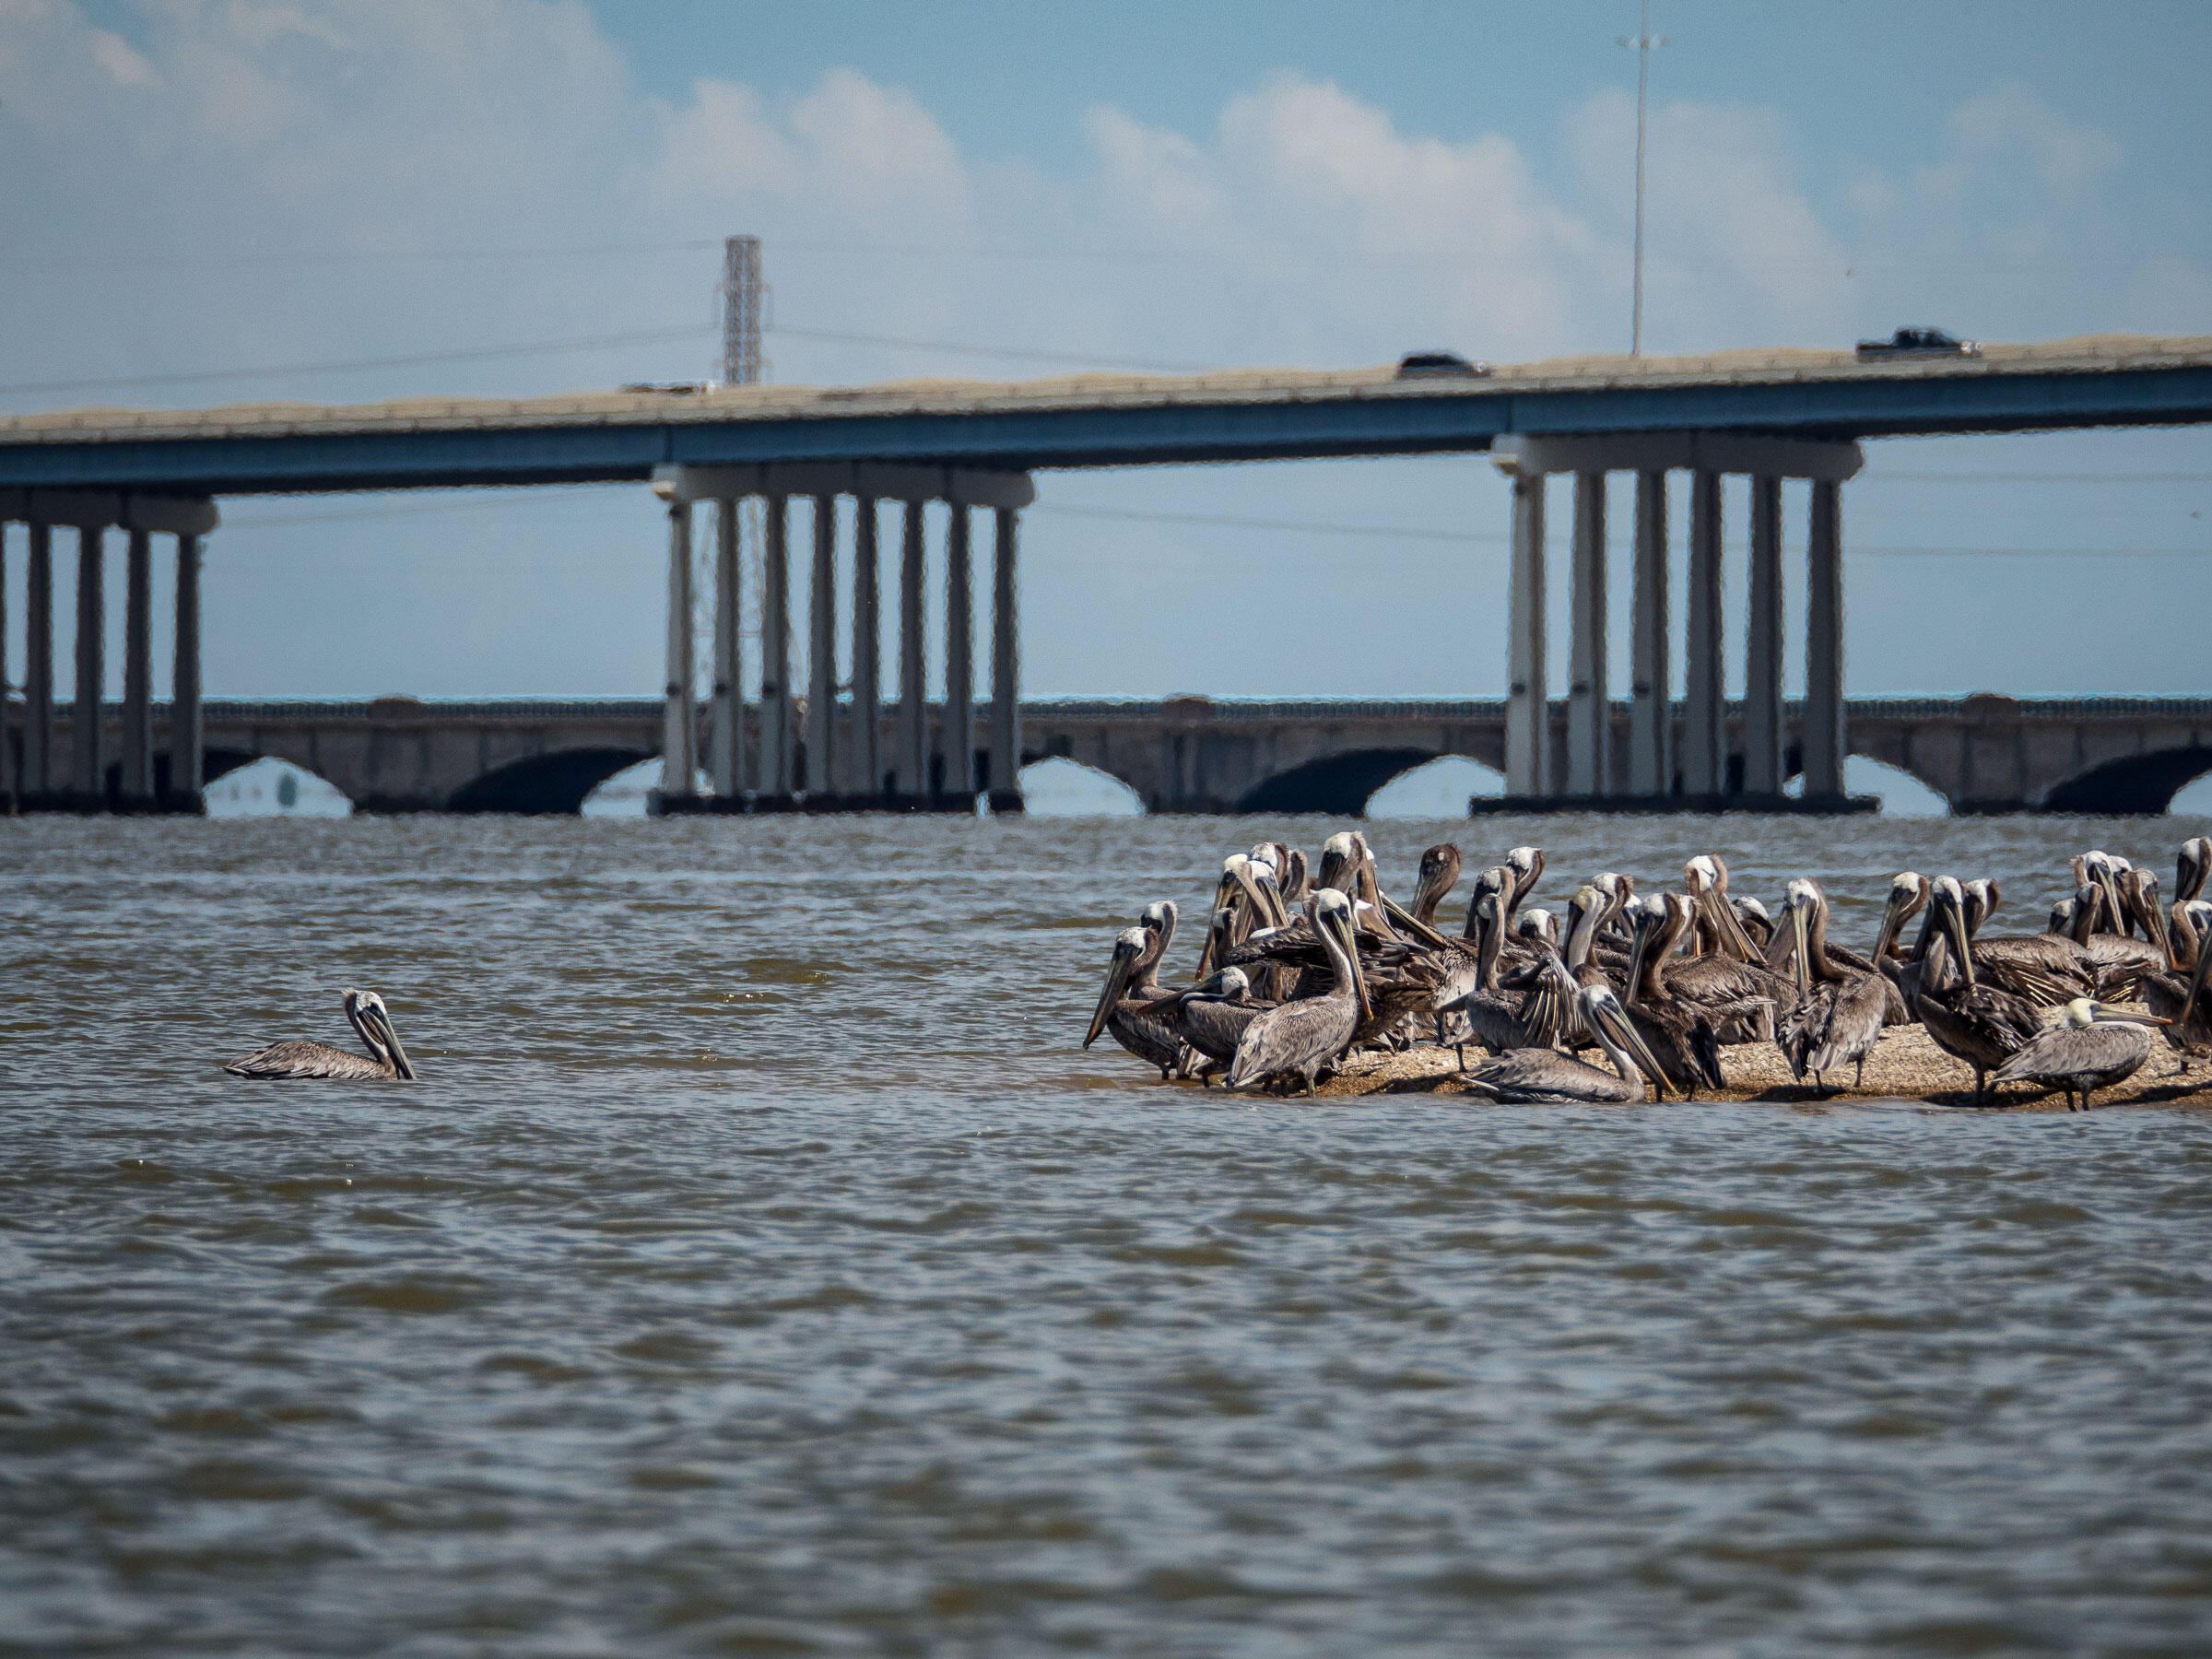 Brown Pelicans cluster on a small sandbar island in Galveston Bay. Preeti Desai/Audubon